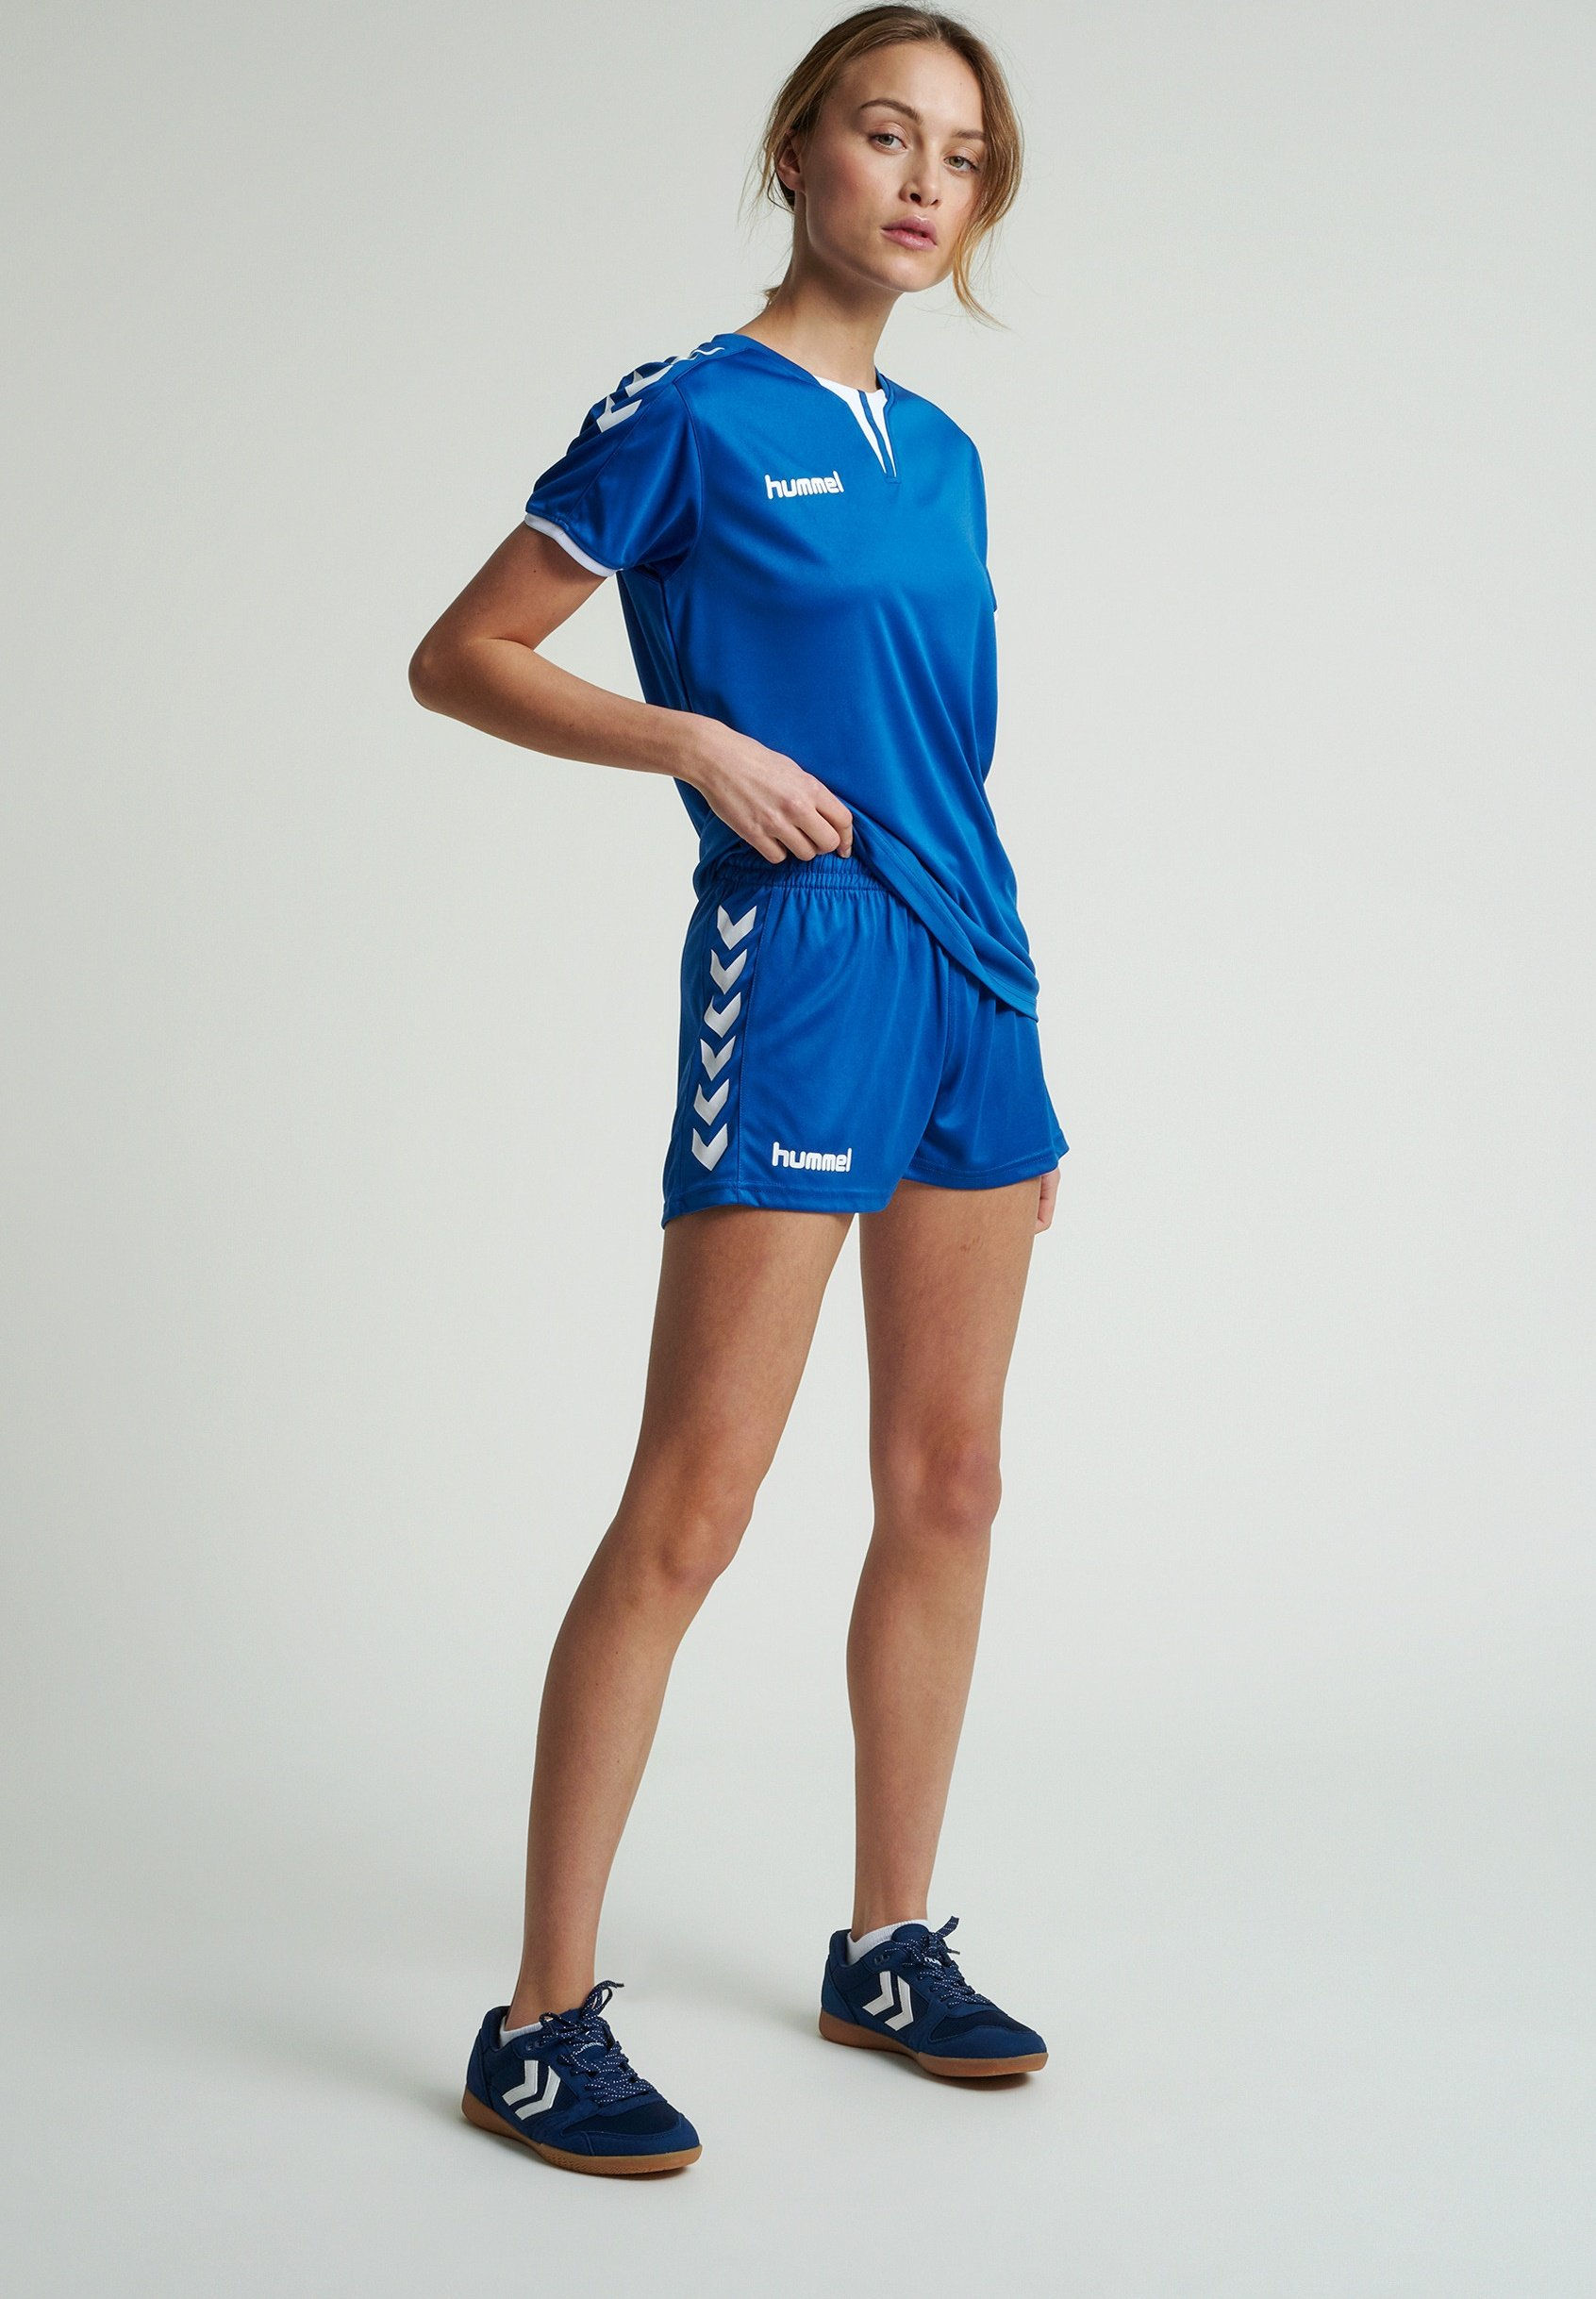 Damen CORE - kurze Sporthose